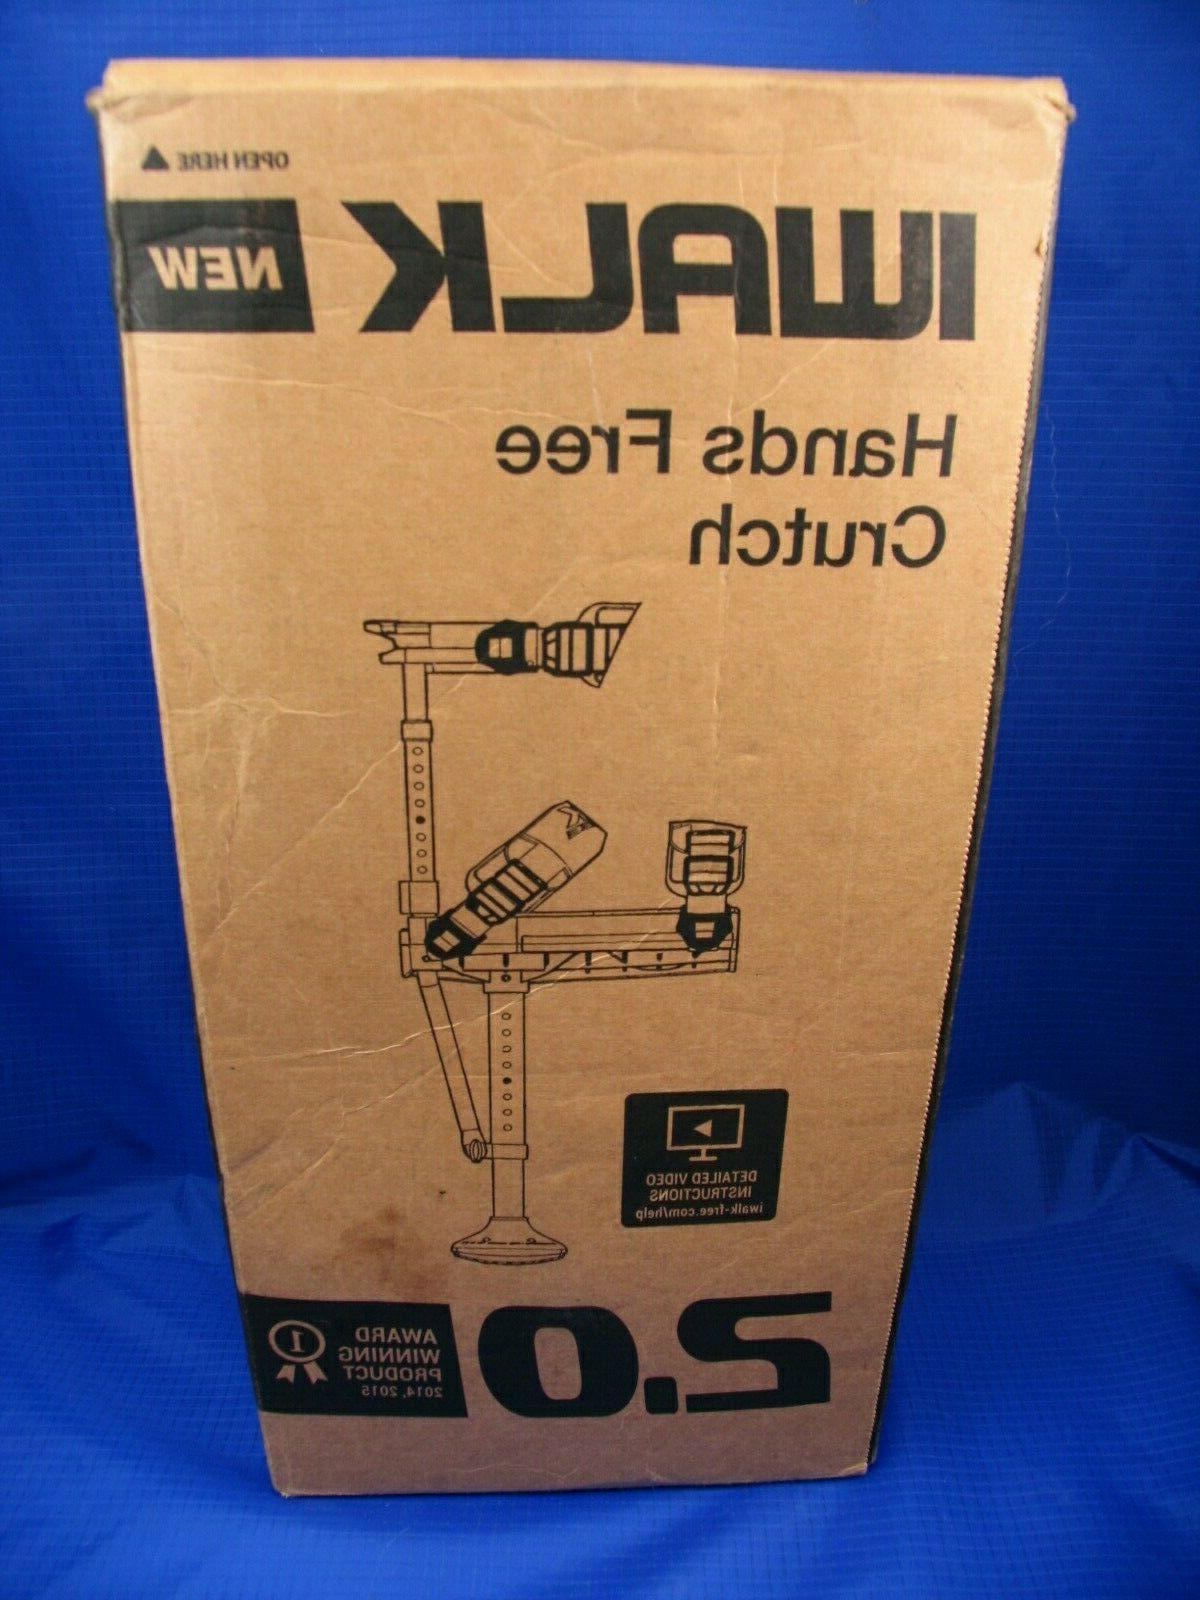 iwalk2 0 hands crutch